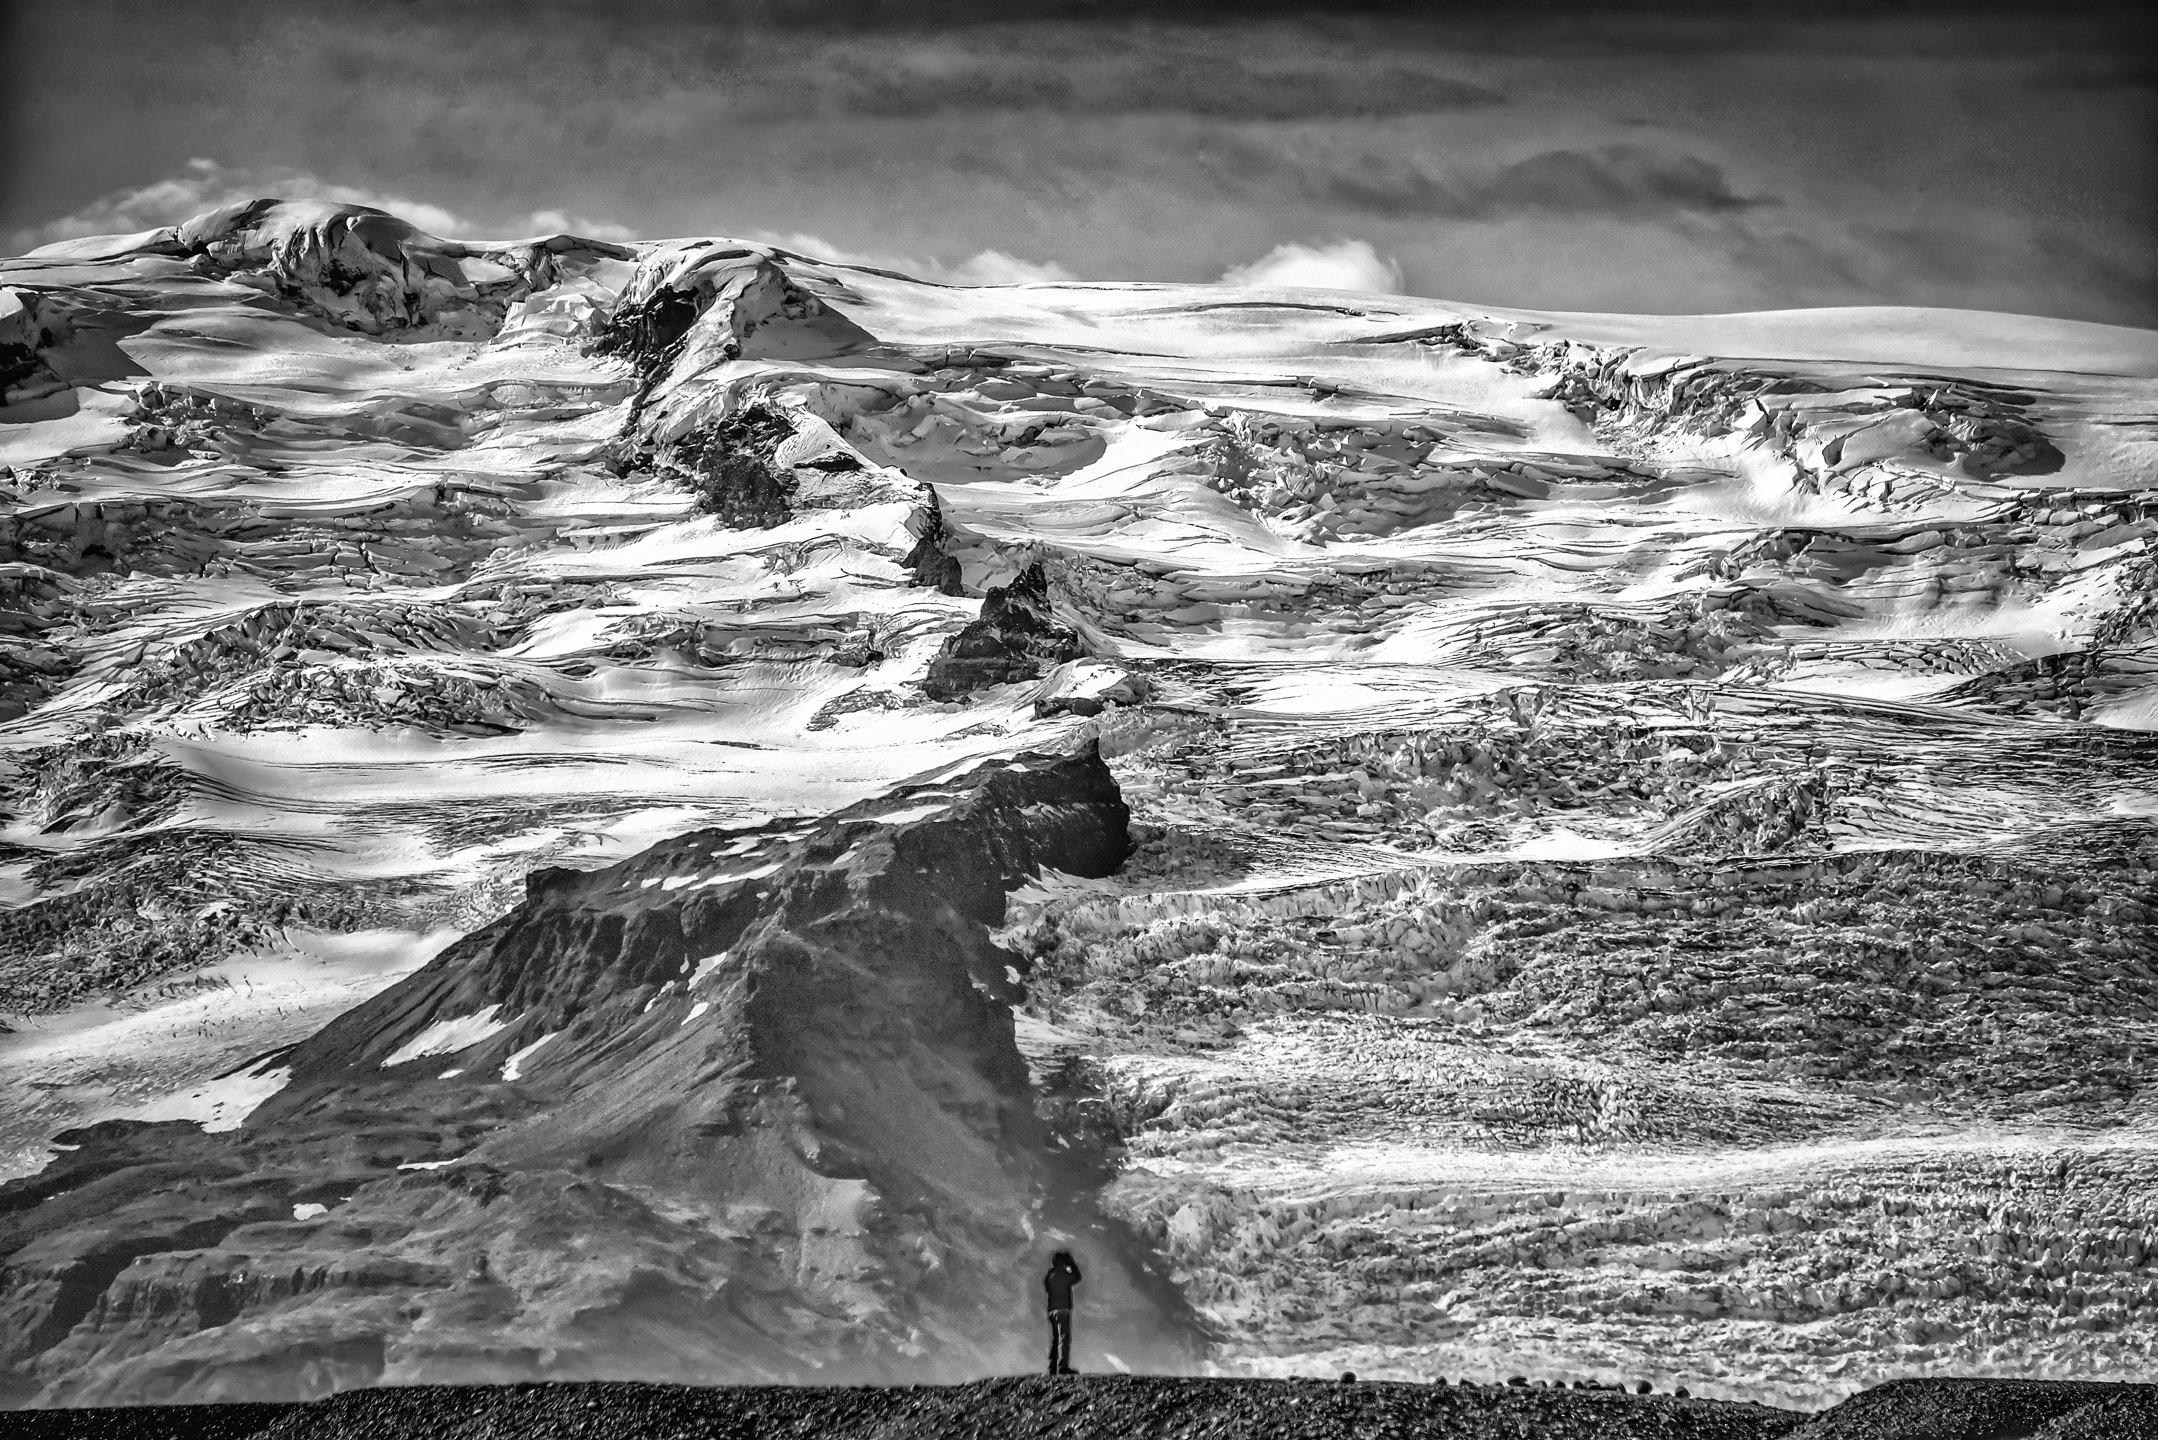 [2012_08_12]_Iceland_Vatnajokul_Glacier_NIKON_D800_(1791)_-_BW_16x11-Edit-Edit[1].jpg